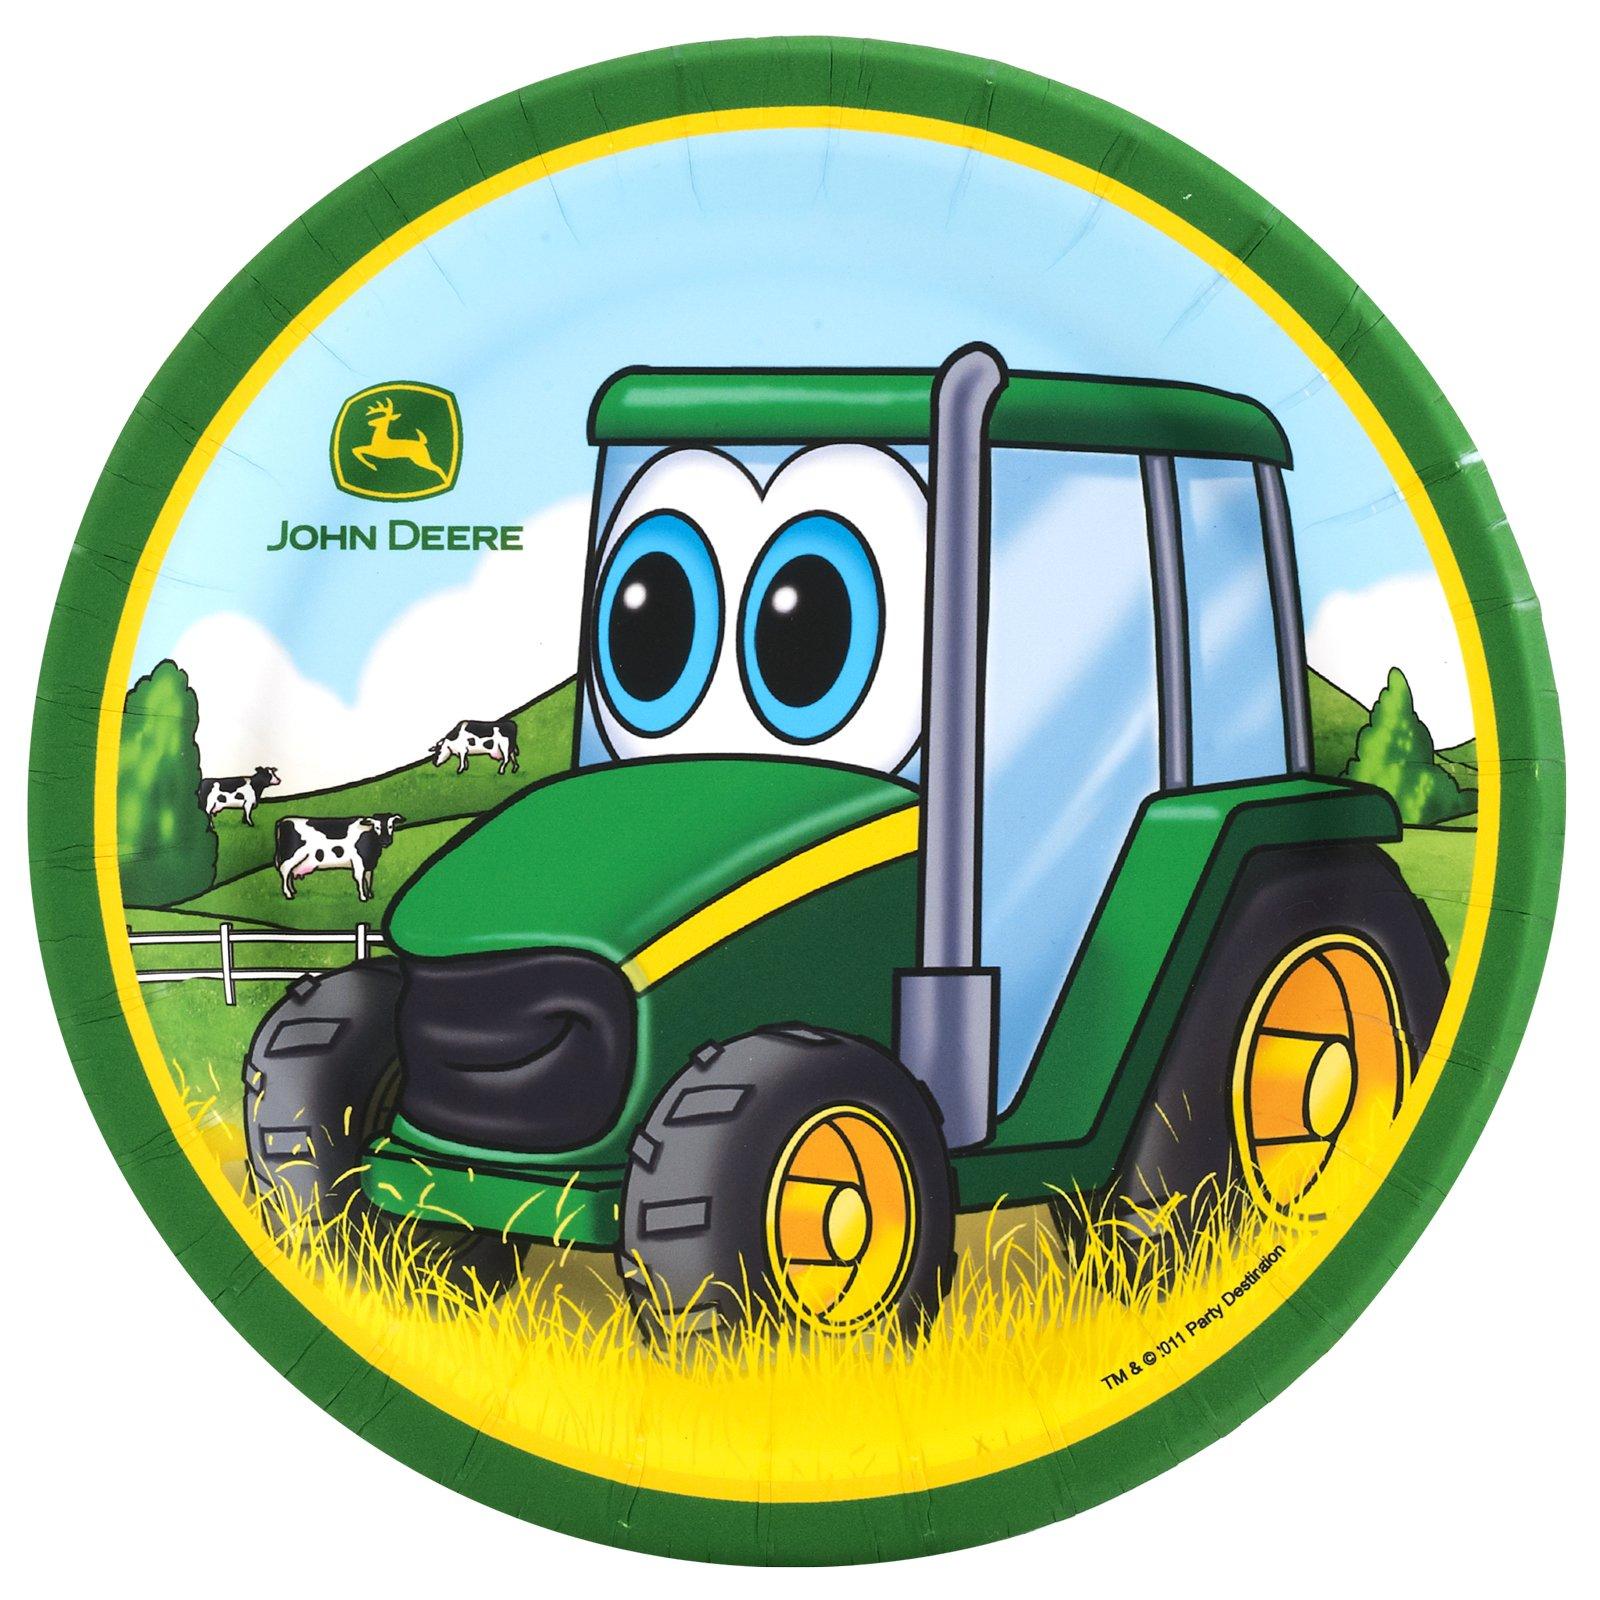 John Deere Tractor Cartoon Prints : John deere clip art free clipart best